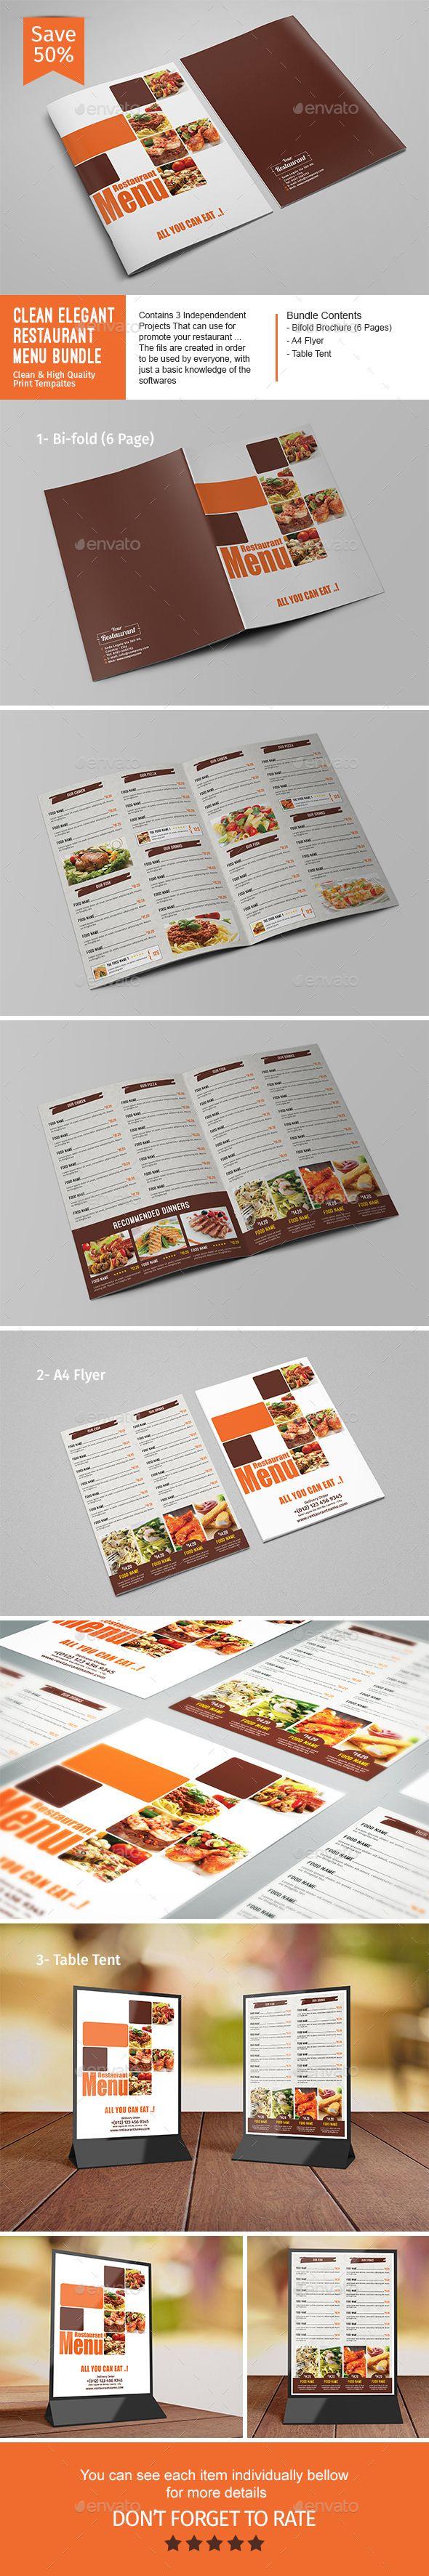 Best Food Design Images On   Menu Templates Print